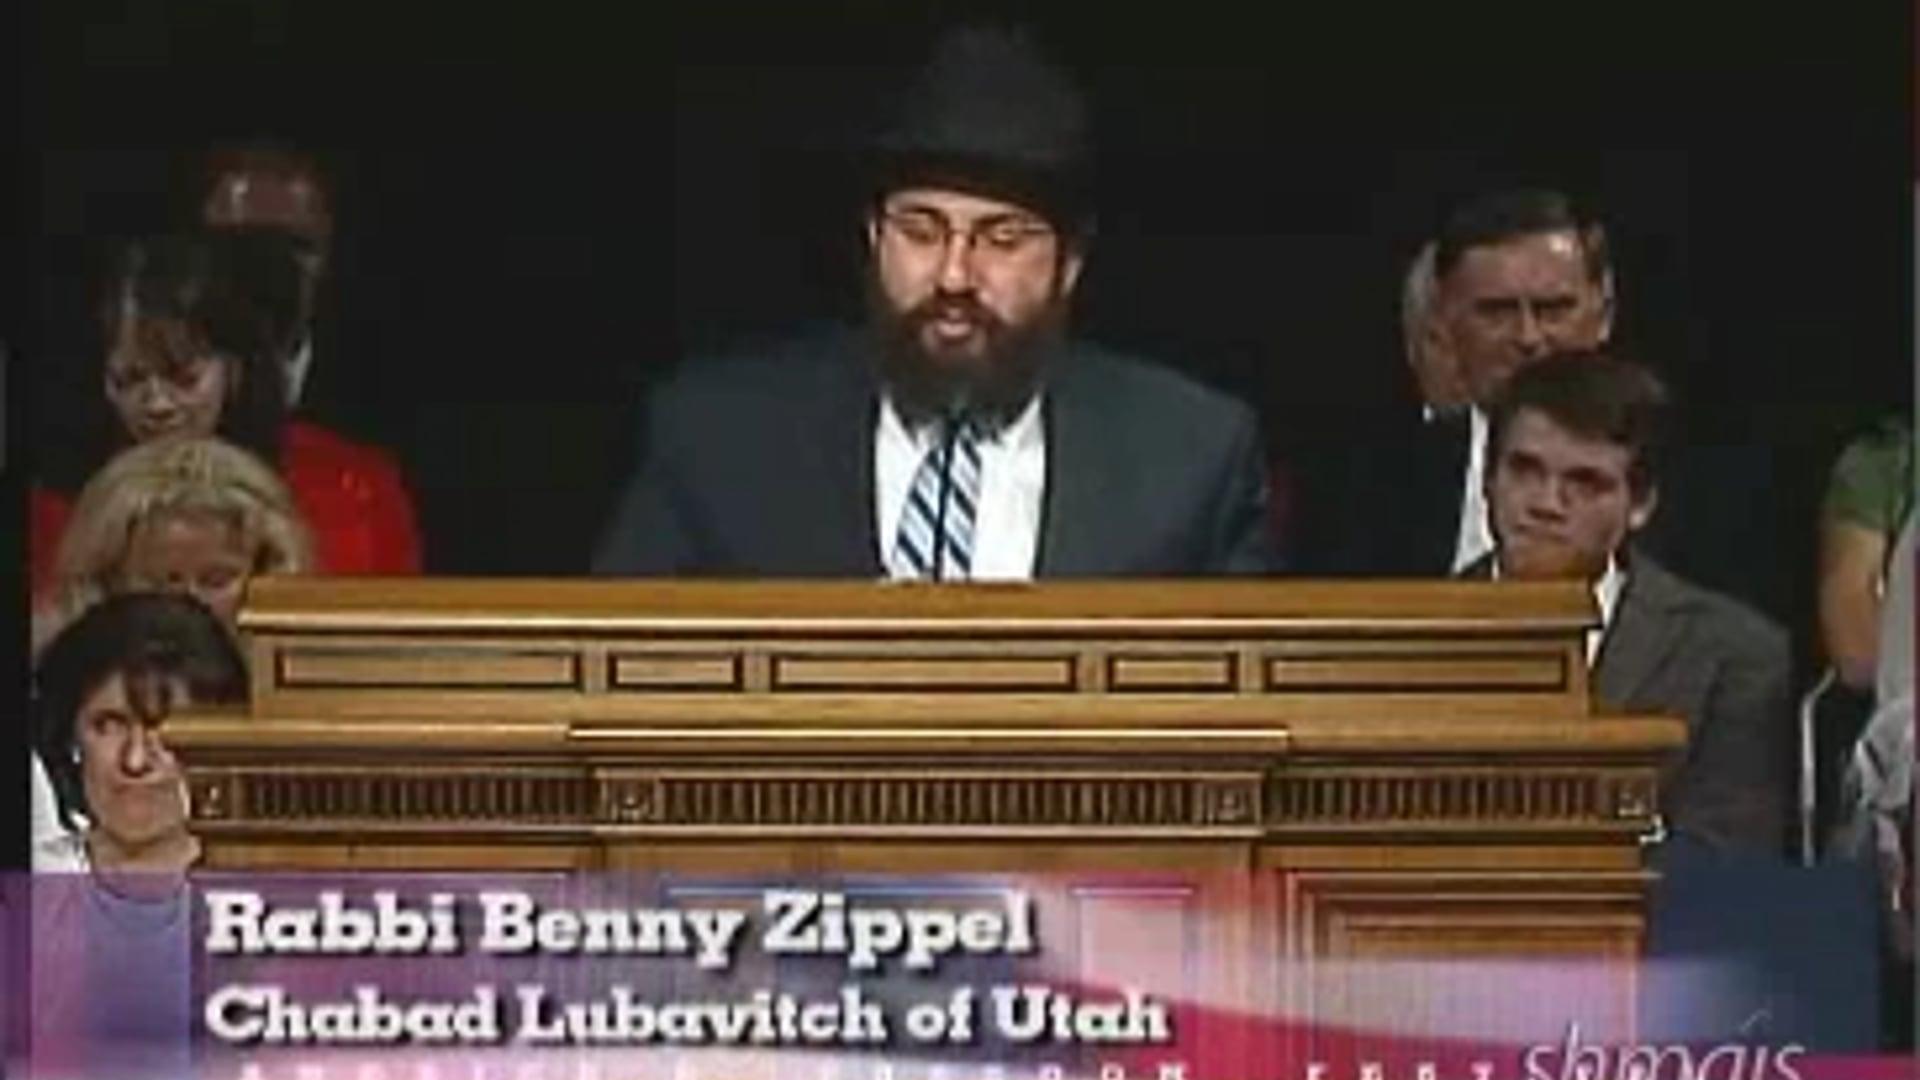 Rabbi Benny Zippel invocation before 17,000